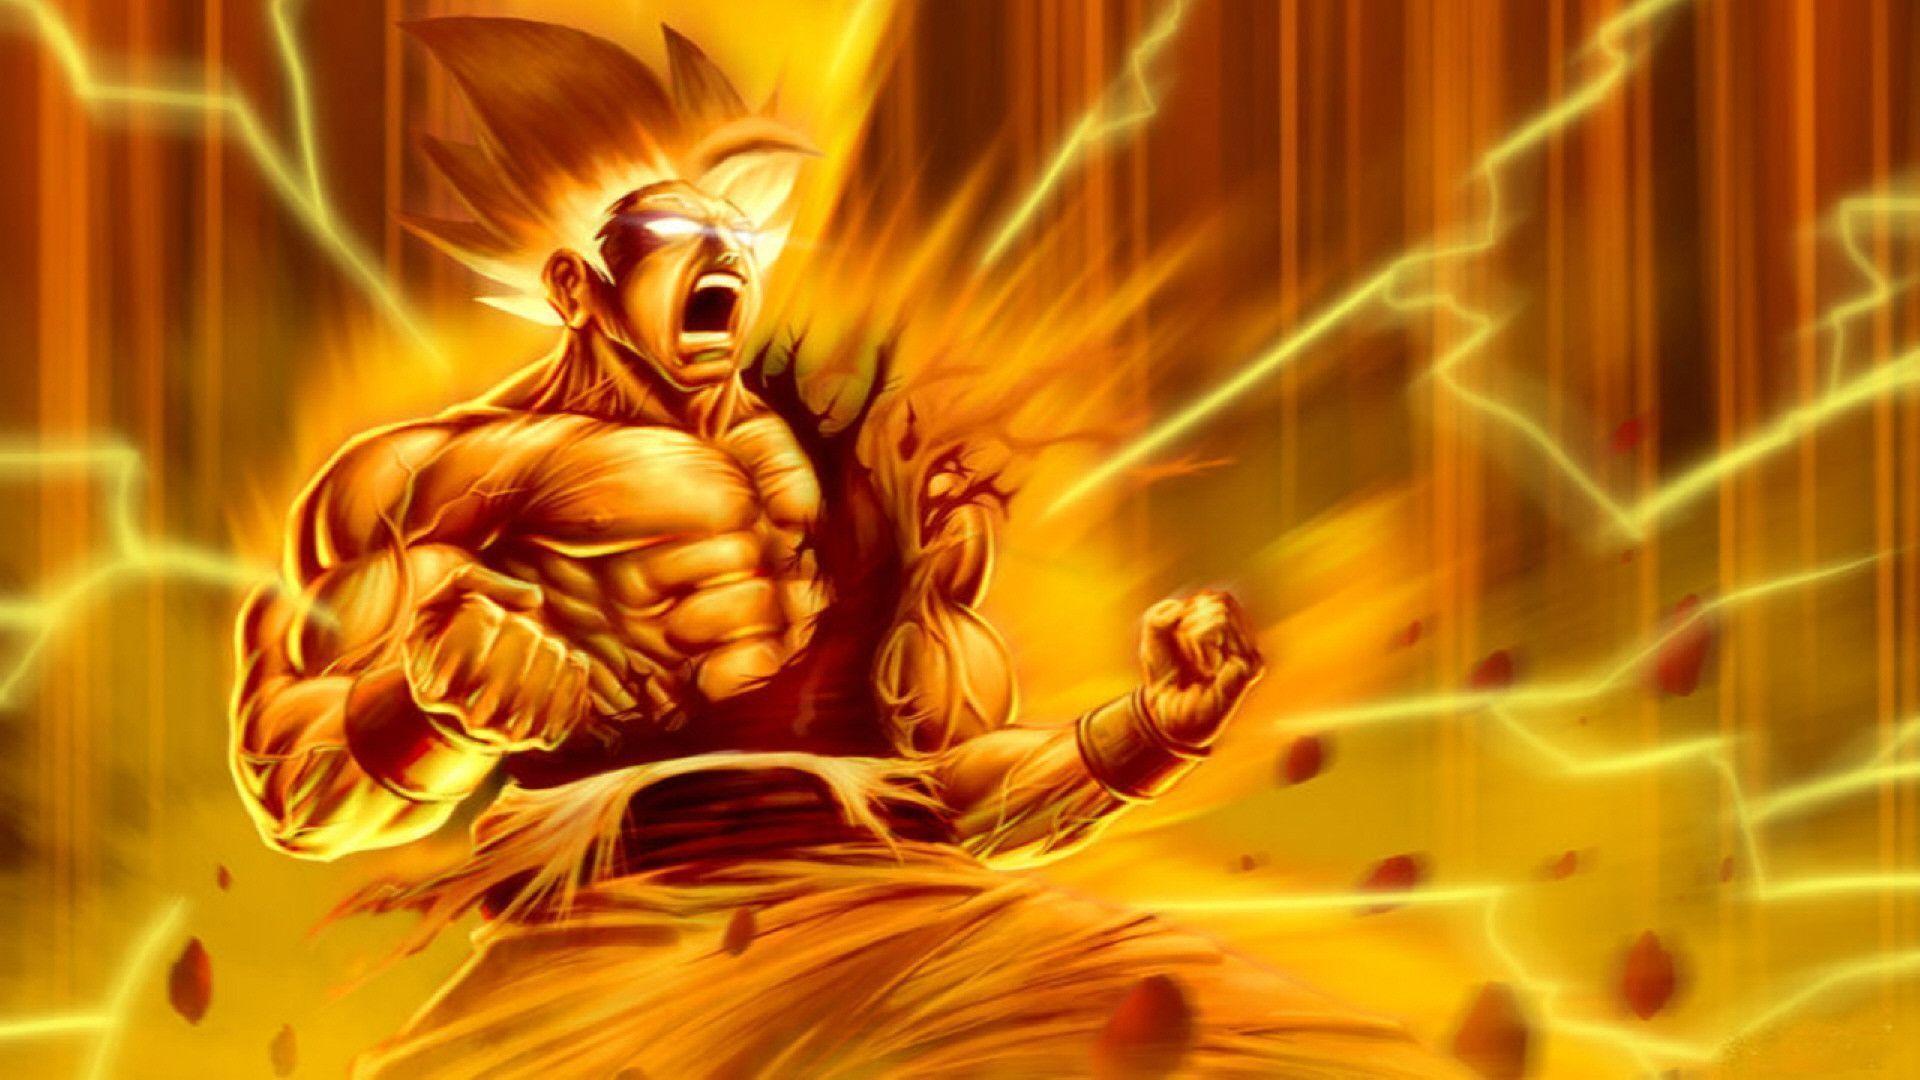 Dragon Ball Z Goku 3D Wallpaper Hd